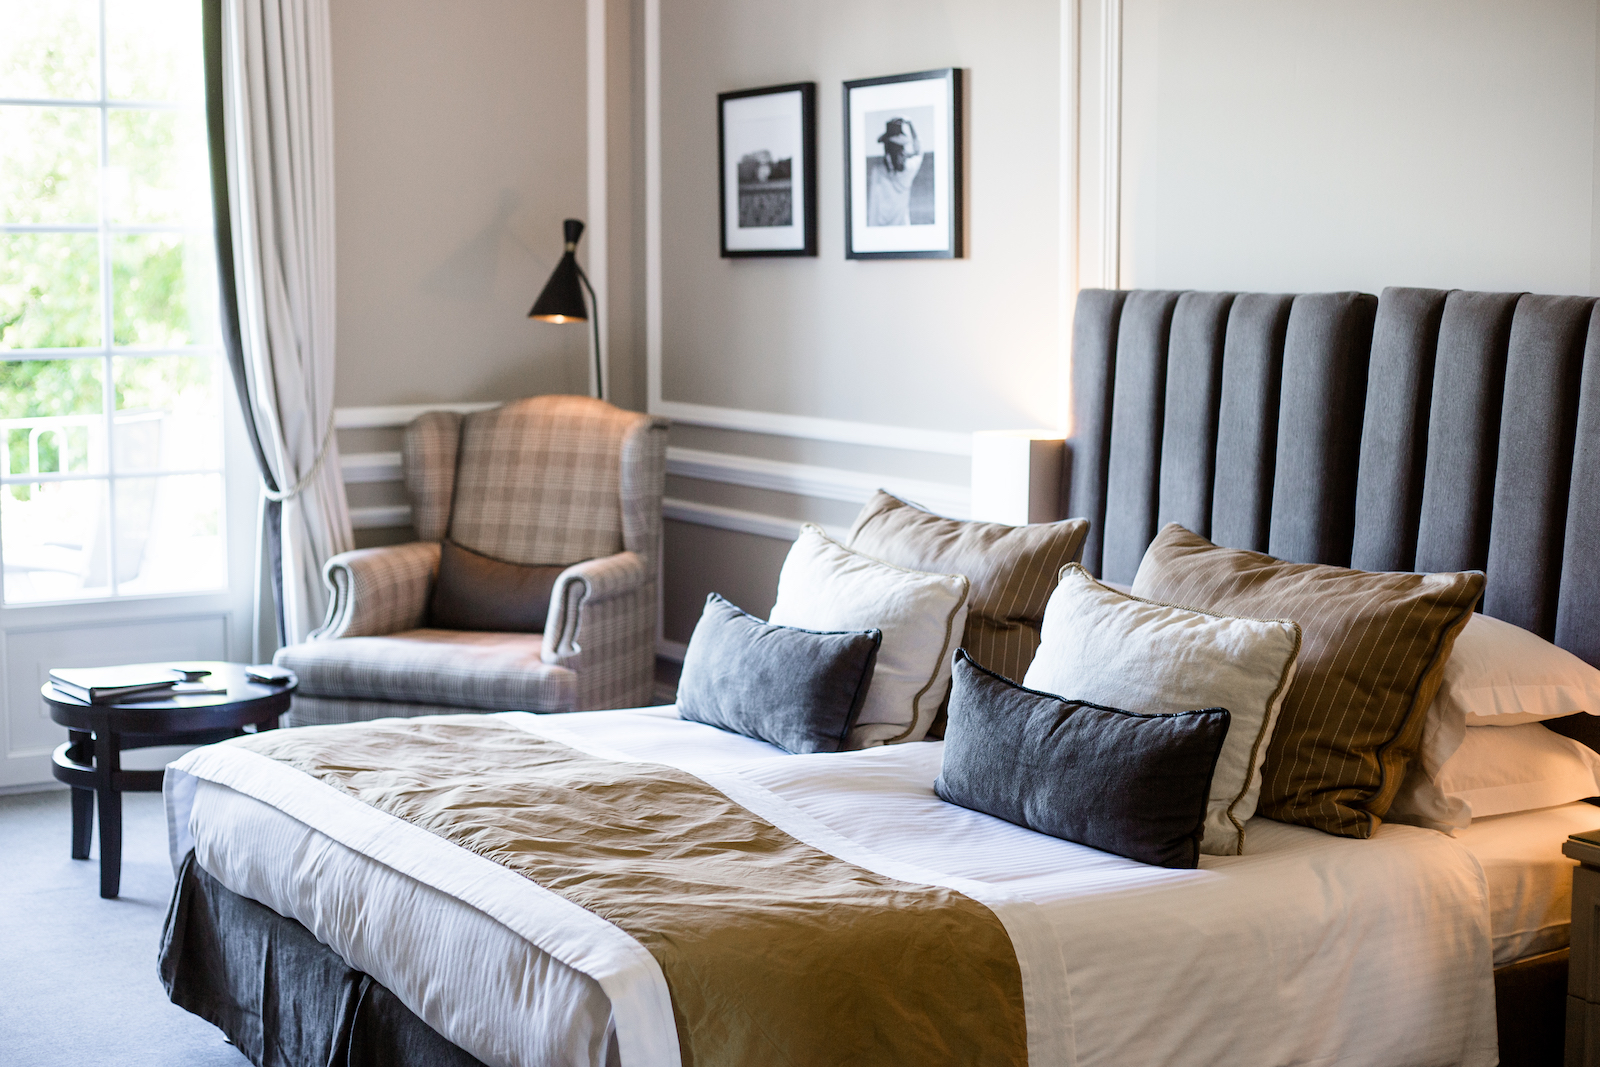 villa-belrose-althoff-hotel-st-tropez-livia-auer-IMG_5839